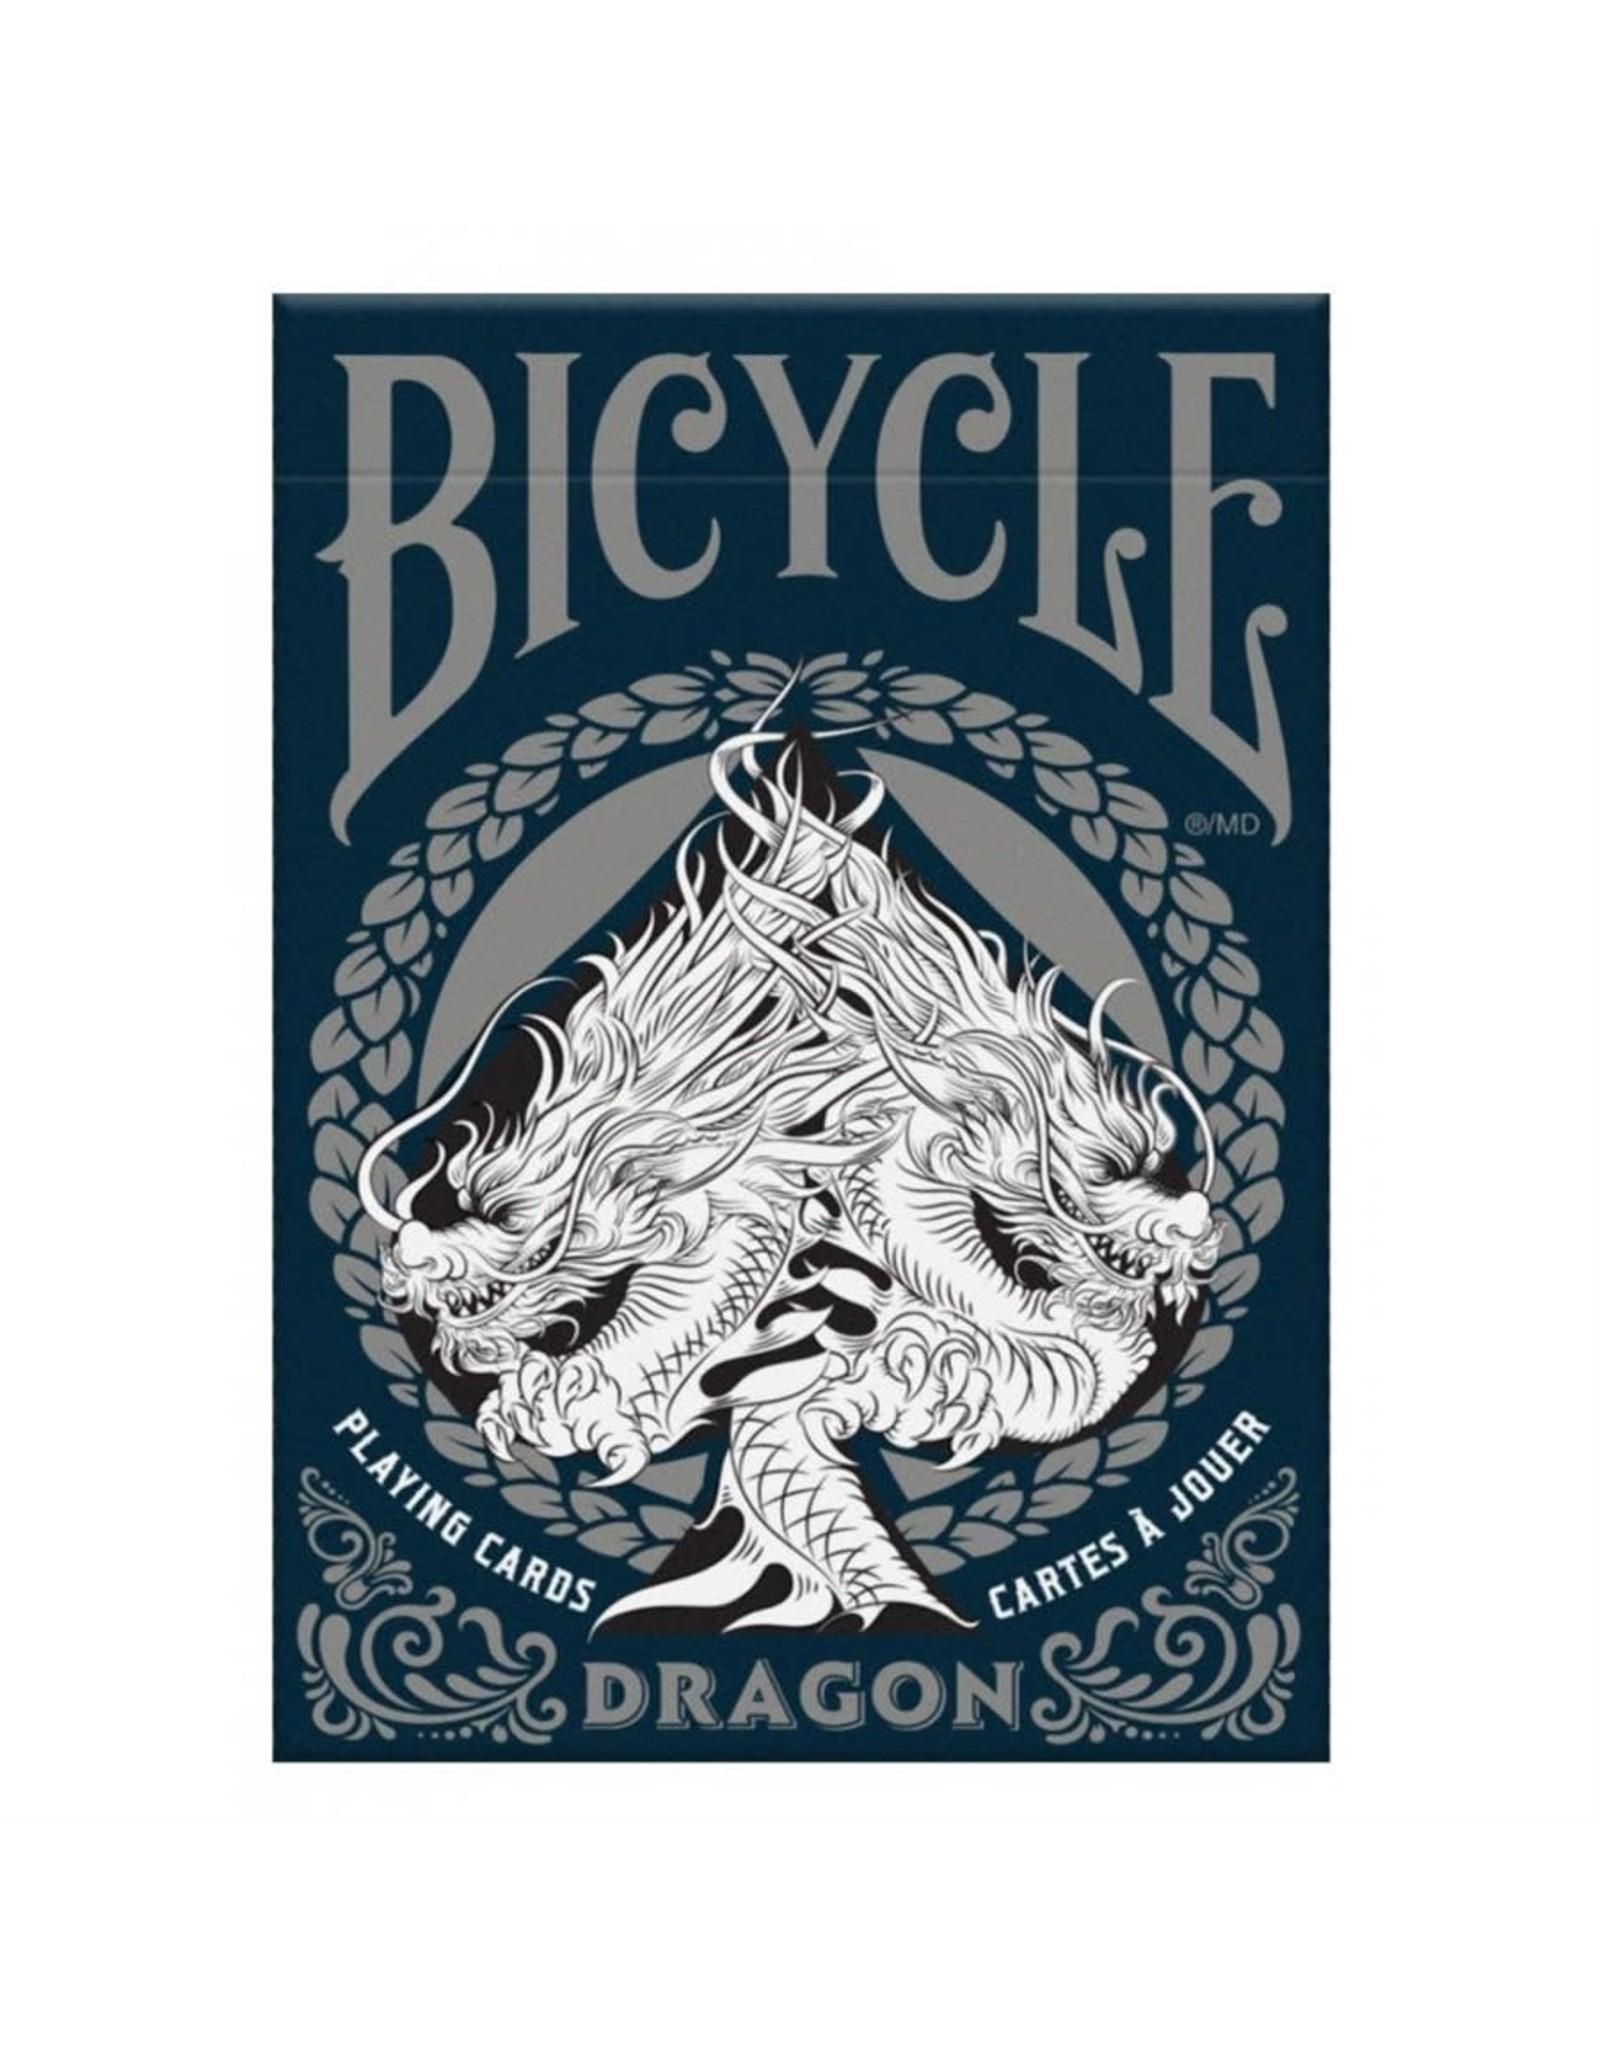 Bicycle Bicycle Dragon - Cartes à Jouer